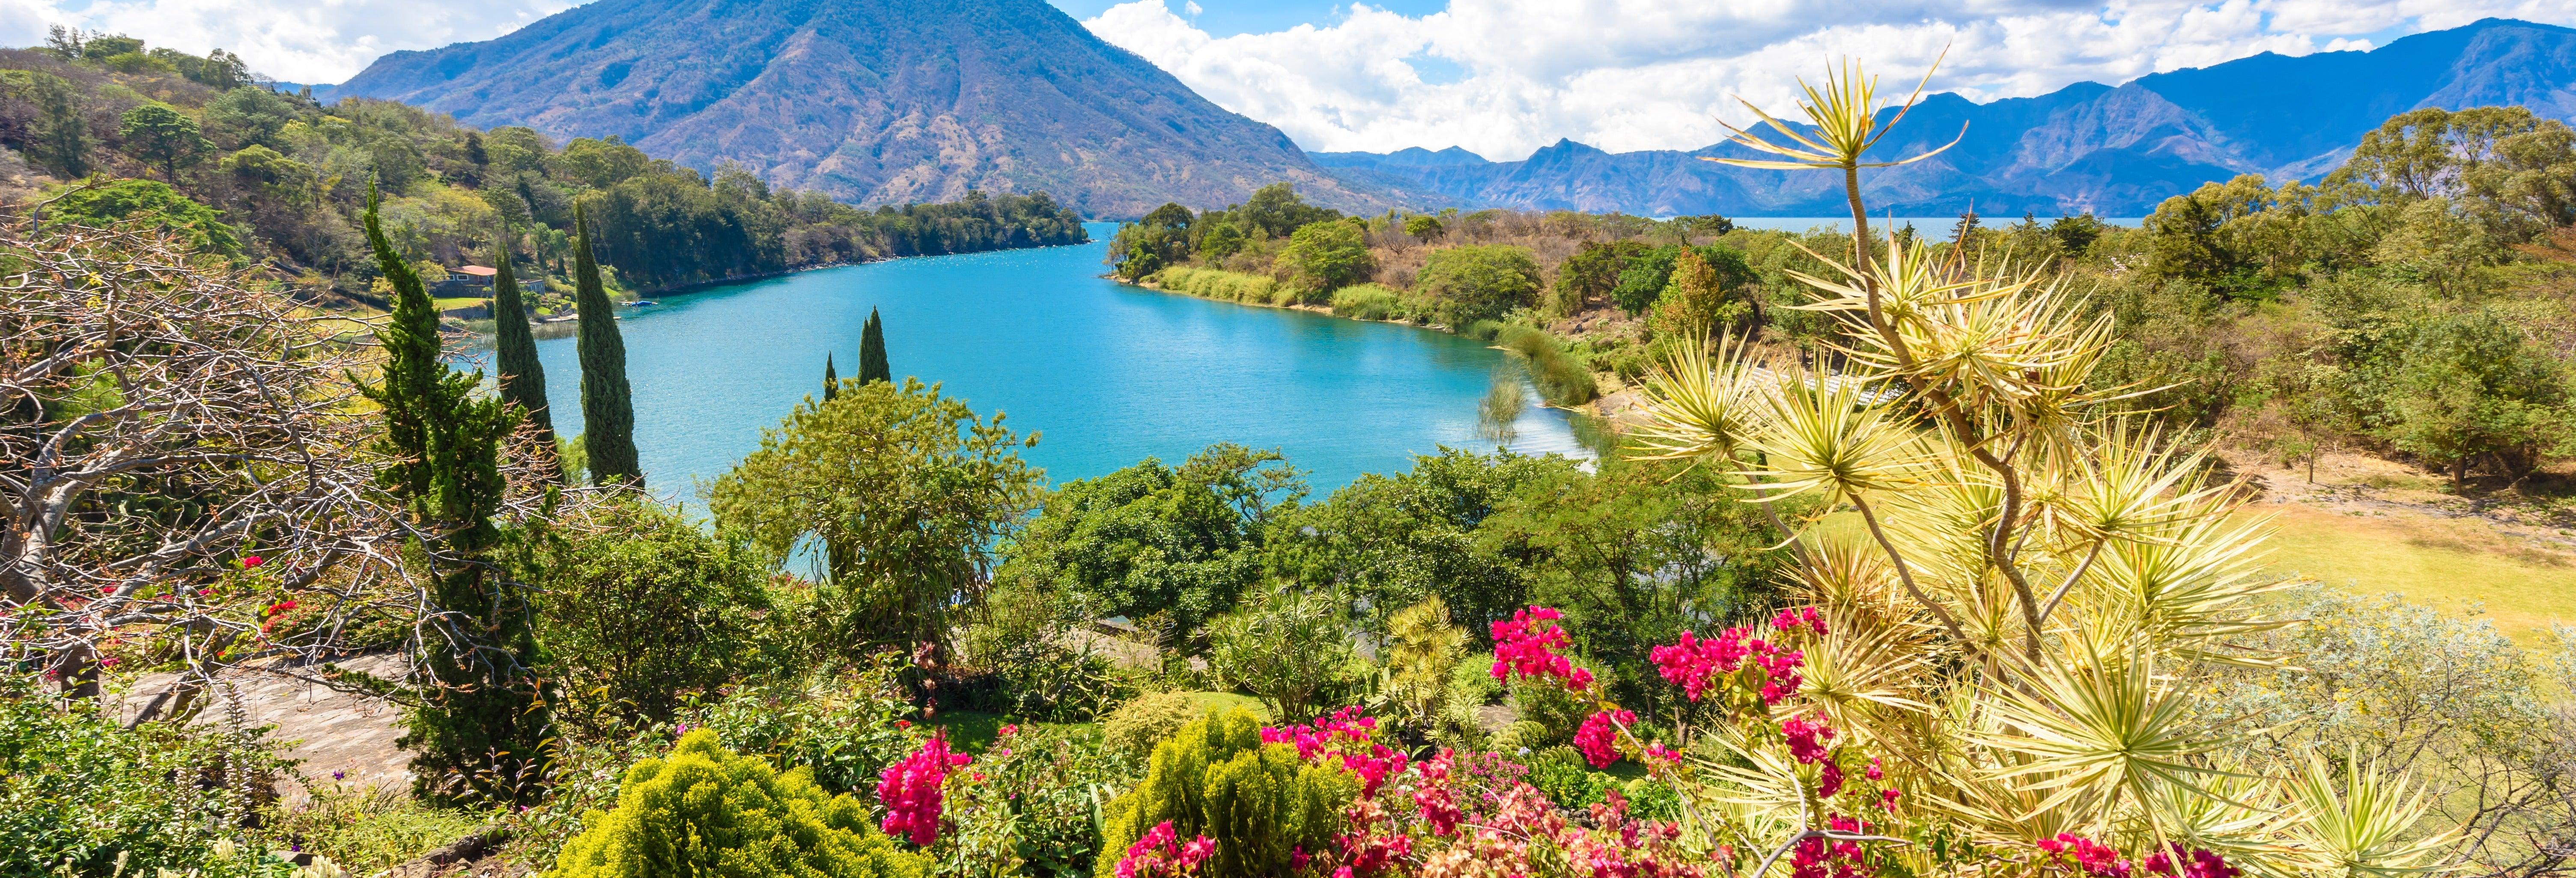 Escursione al Lago Atitlán + Giro in barca a Santiago